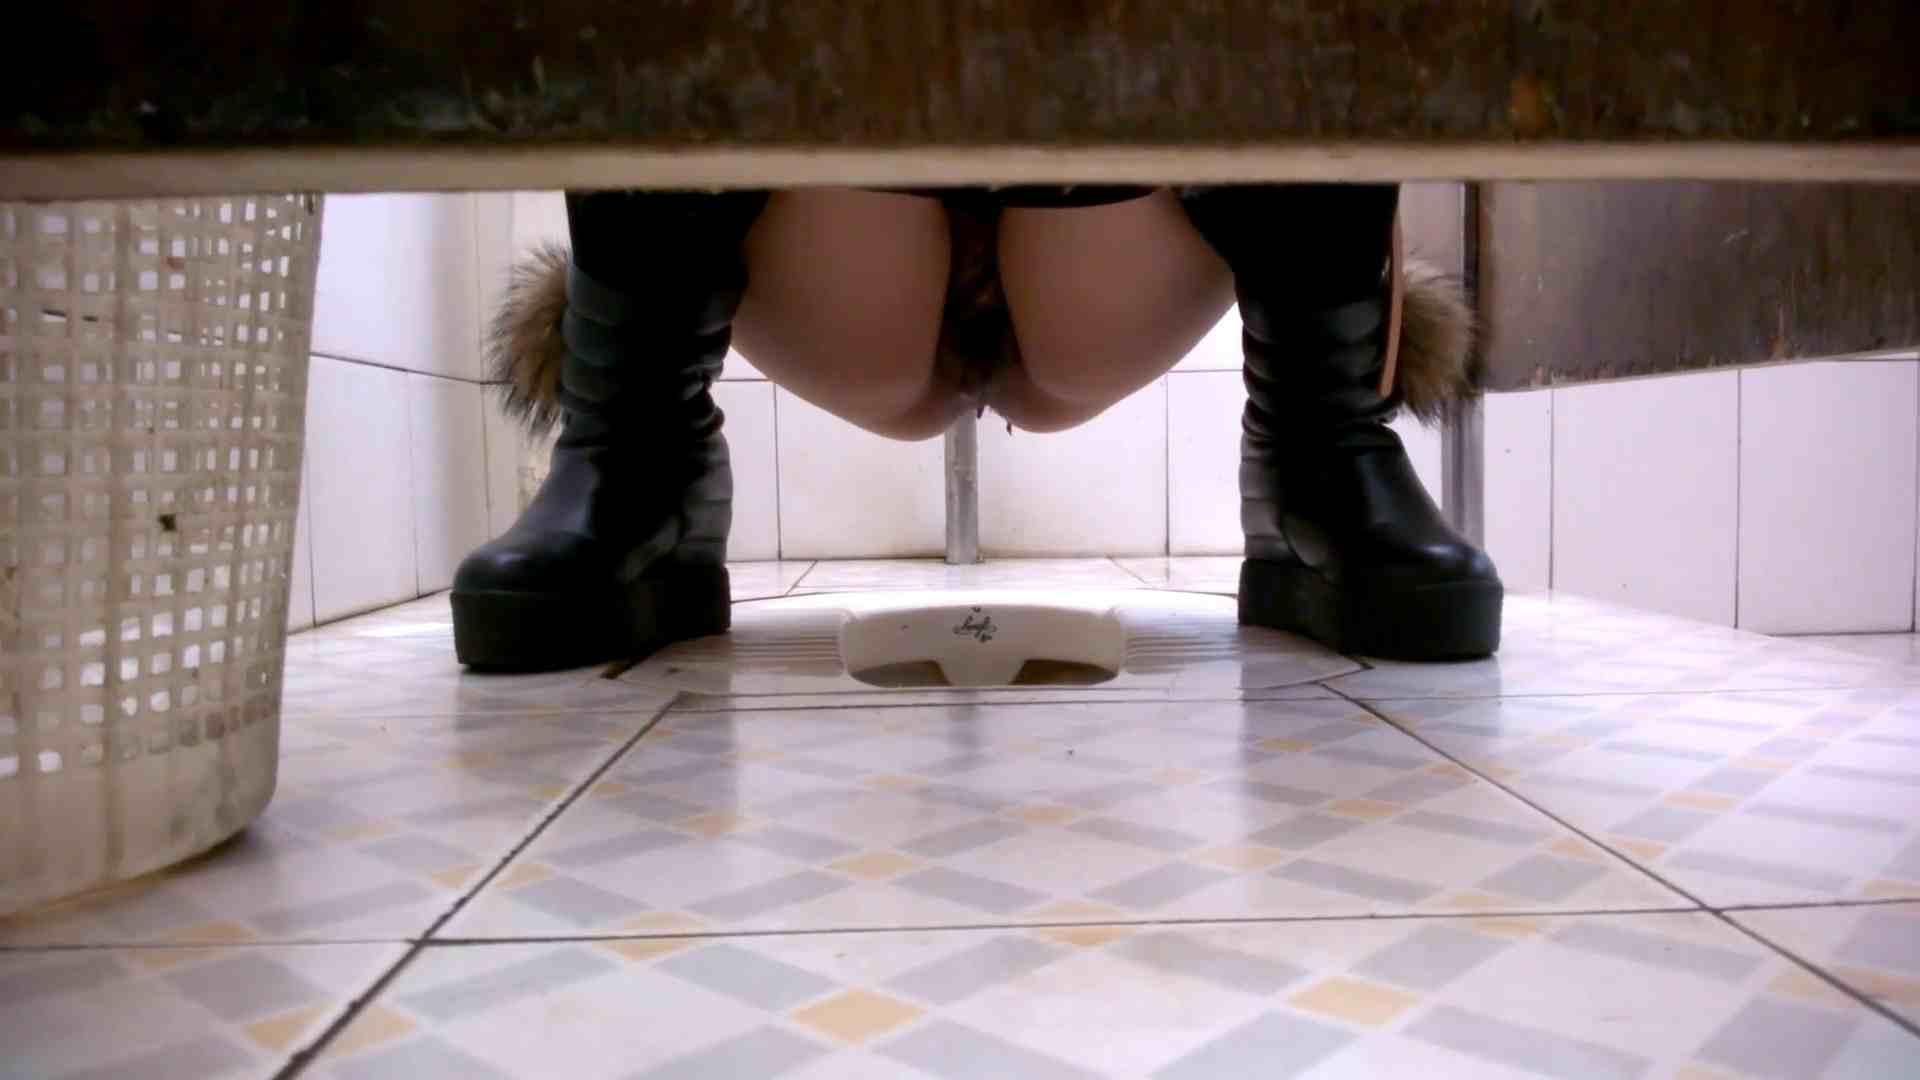 JD盗撮 美女の洗面所の秘密 Vol.34 トイレで・・・   美女  98画像 45